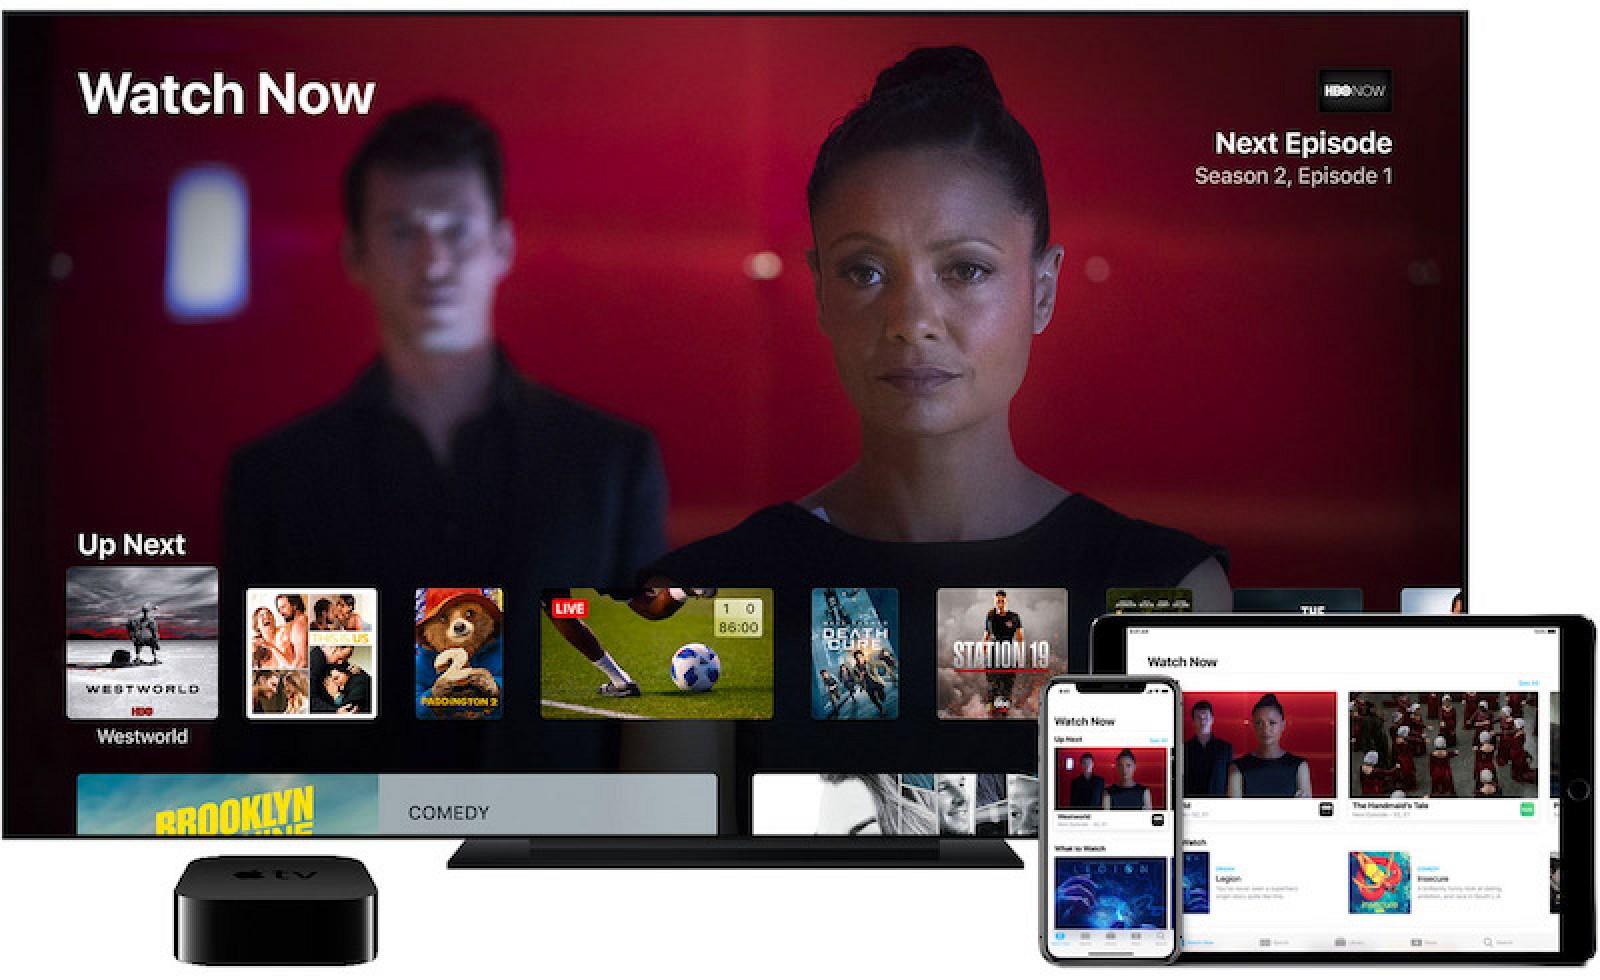 How to Watch Now TV On a Mac - Macworld UK